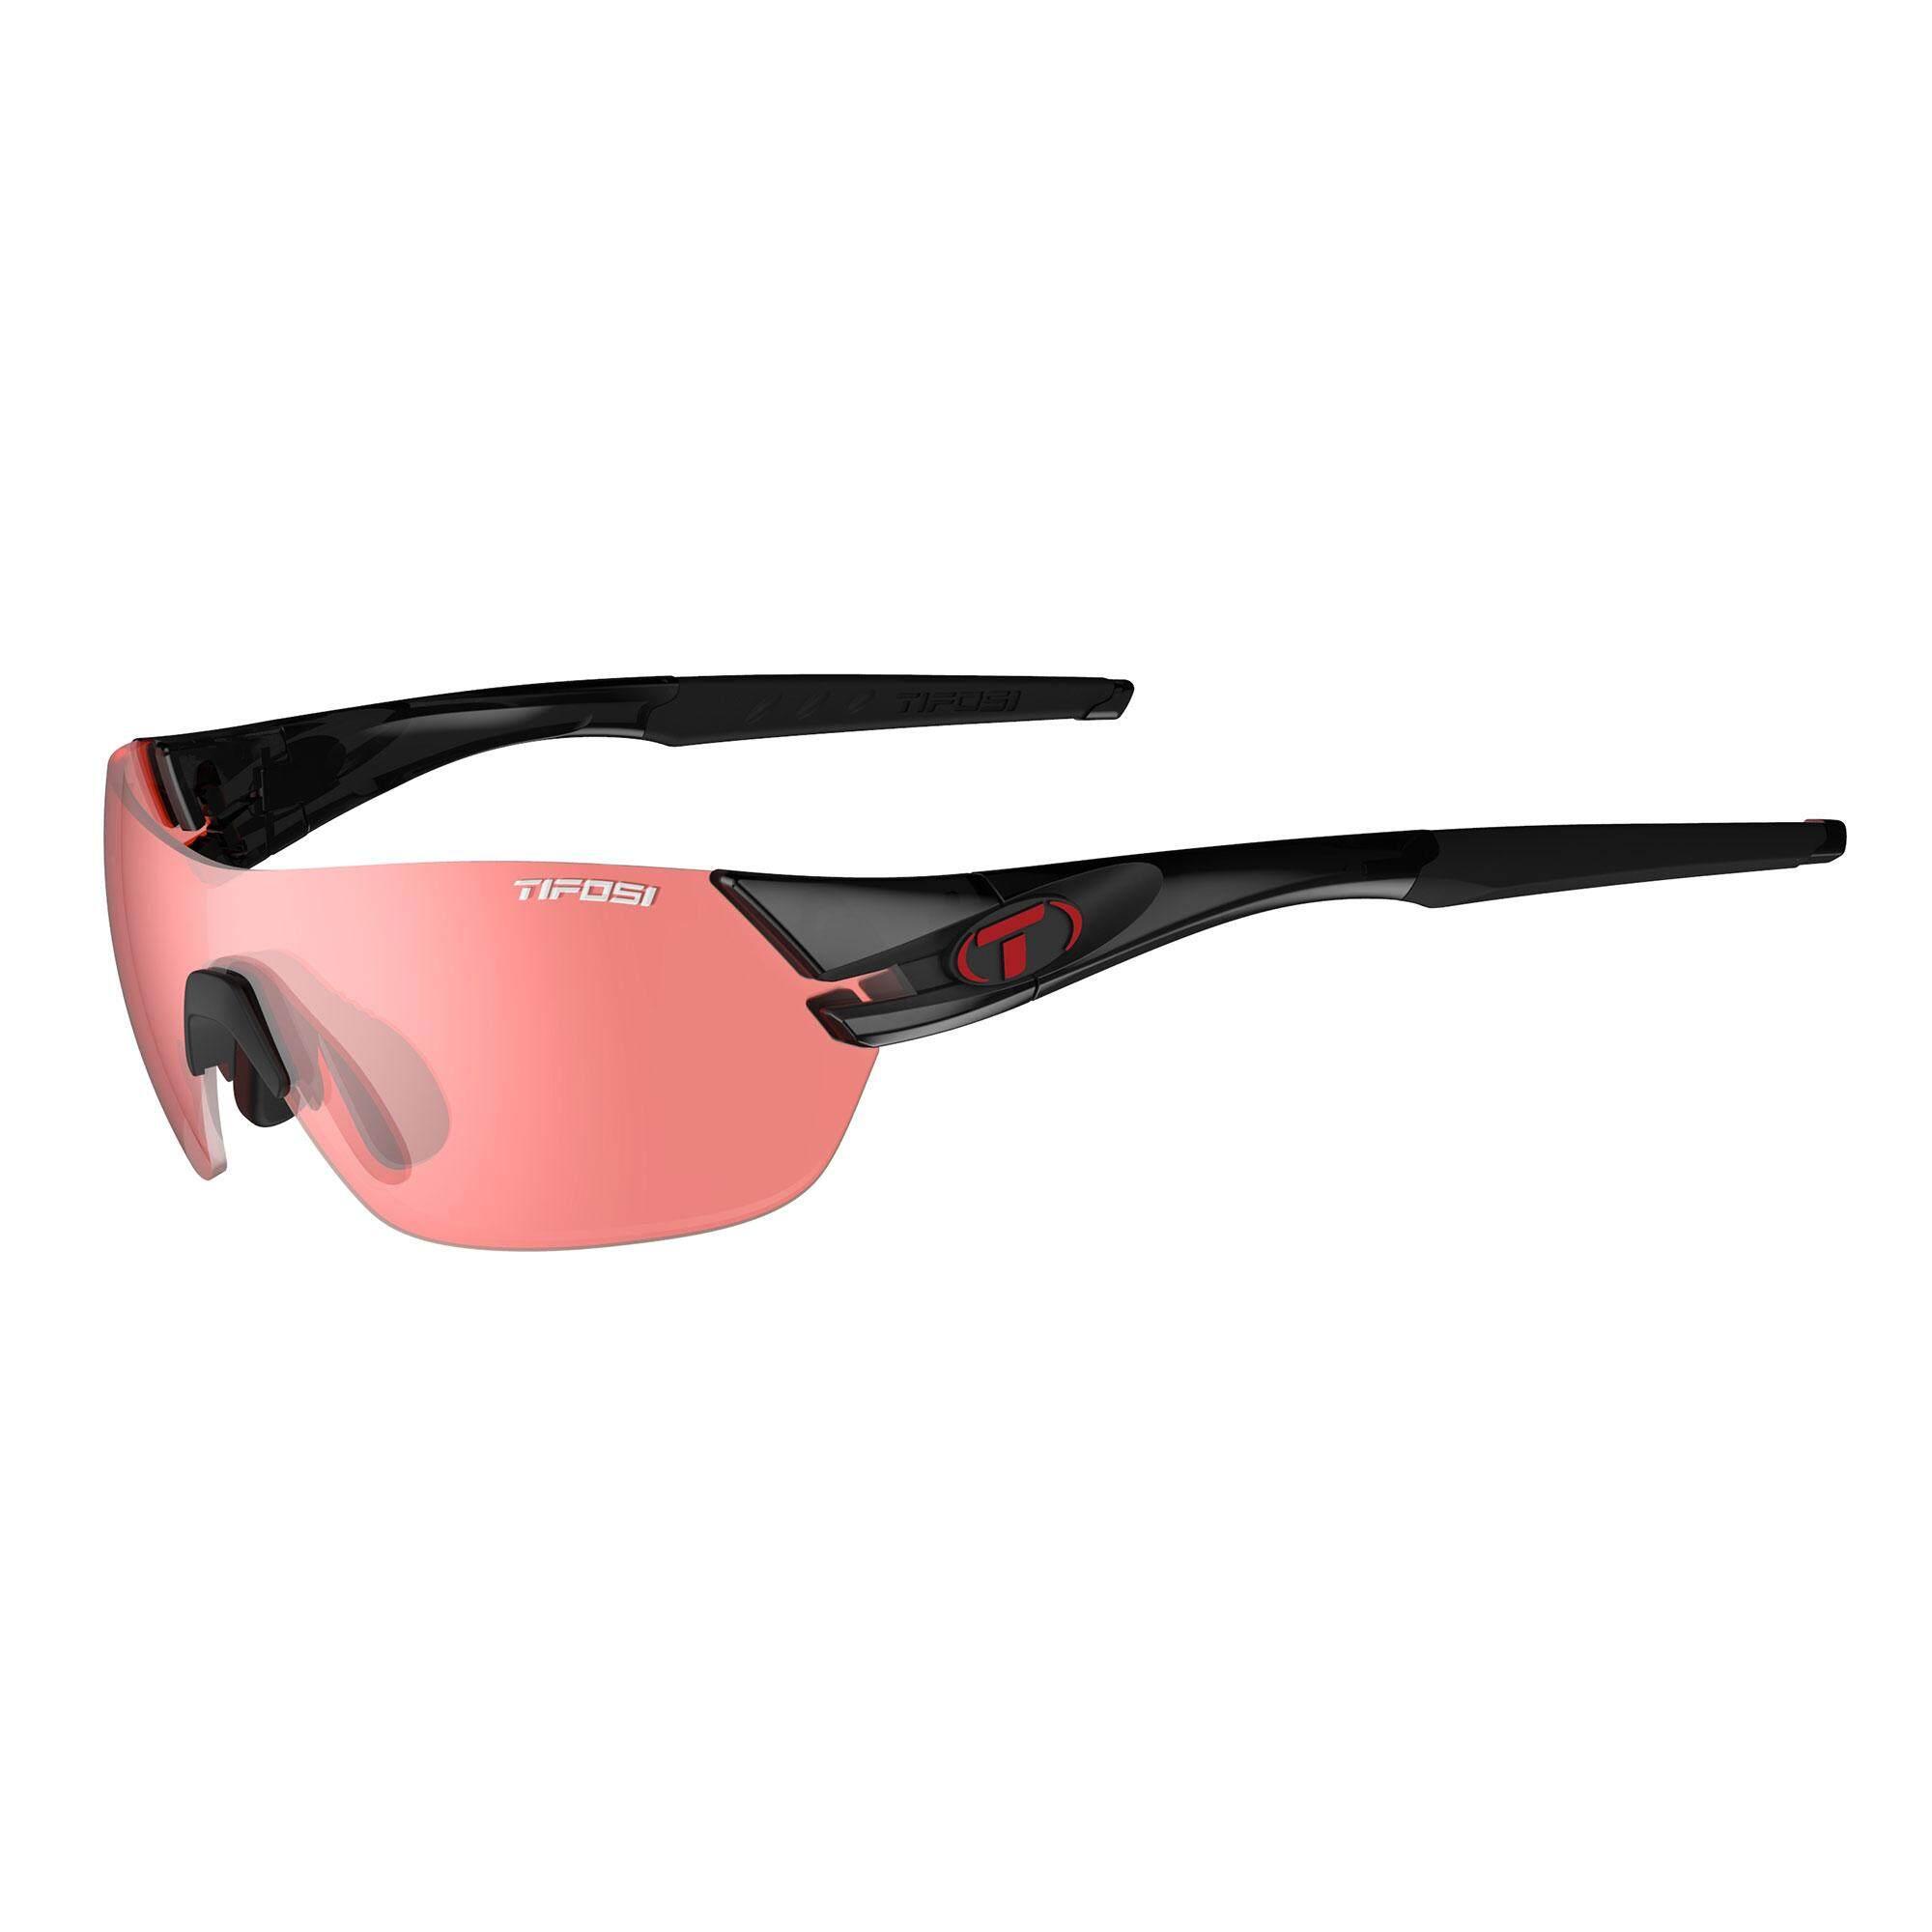 Tifosi Sunglasses แว่นกันแดด รุ่น SLICE Crystal Black (Enliven Bike)